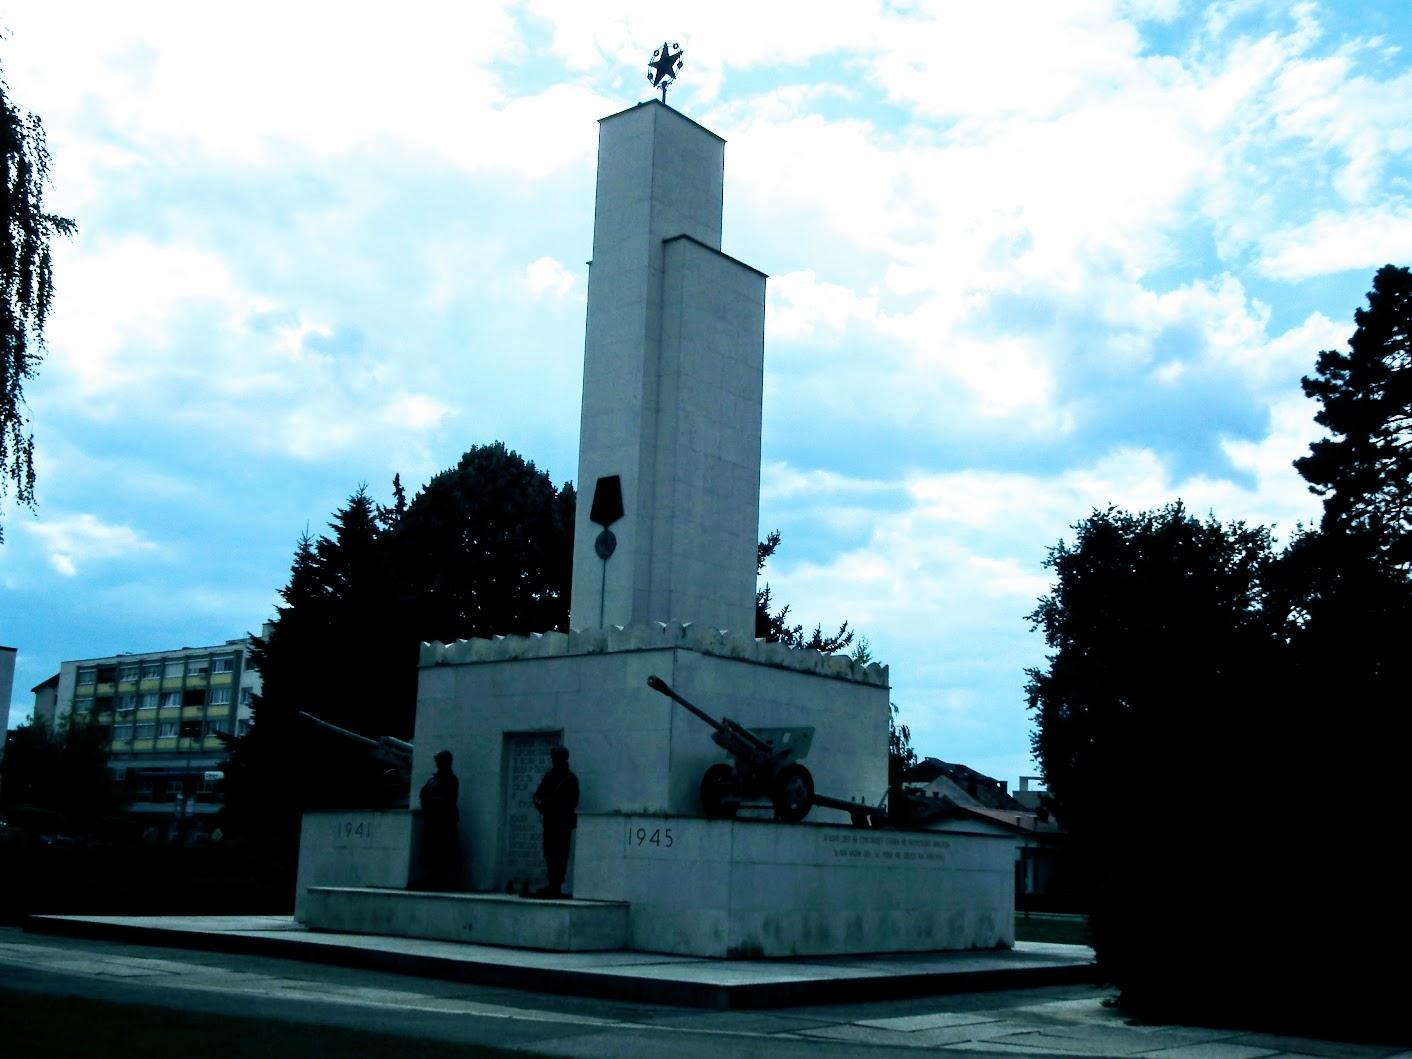 Murska Sobota (Muraszombat) - Spomenik zmage (A győzelem emlékműve)